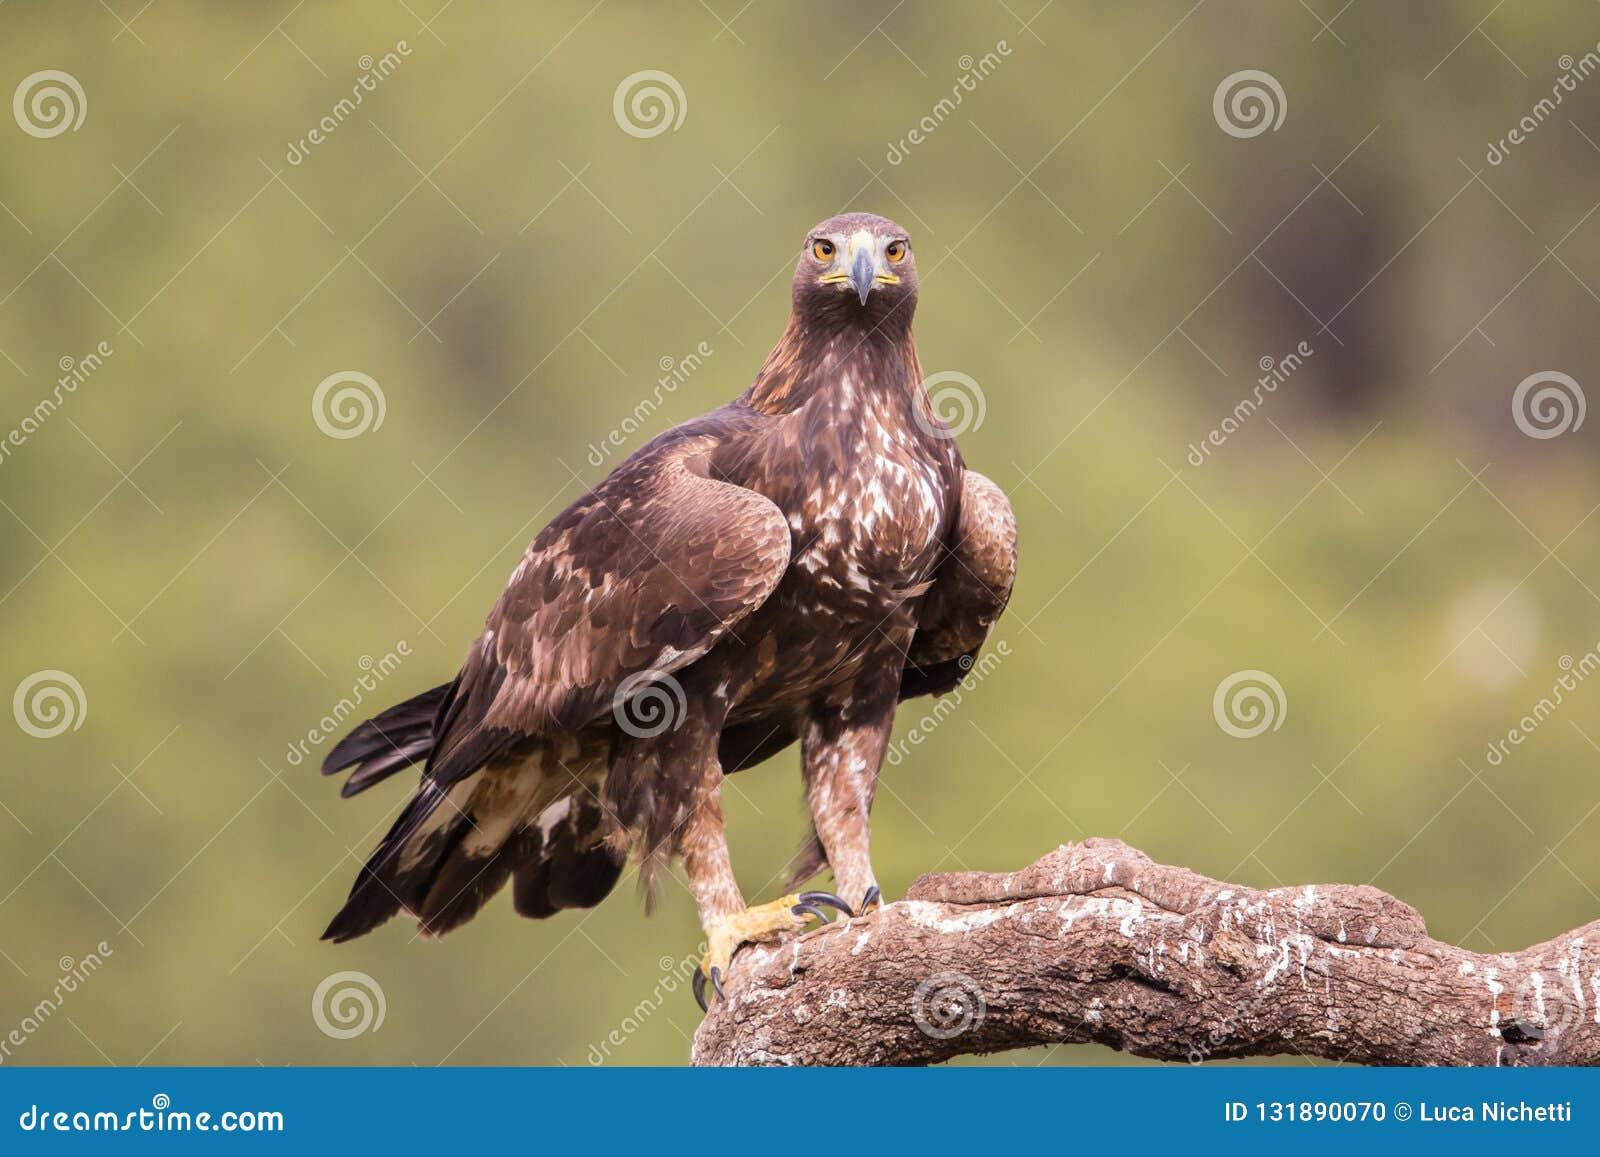 Golden eagle (Aquila chrysaetos), Andalusia, Spain stock photo